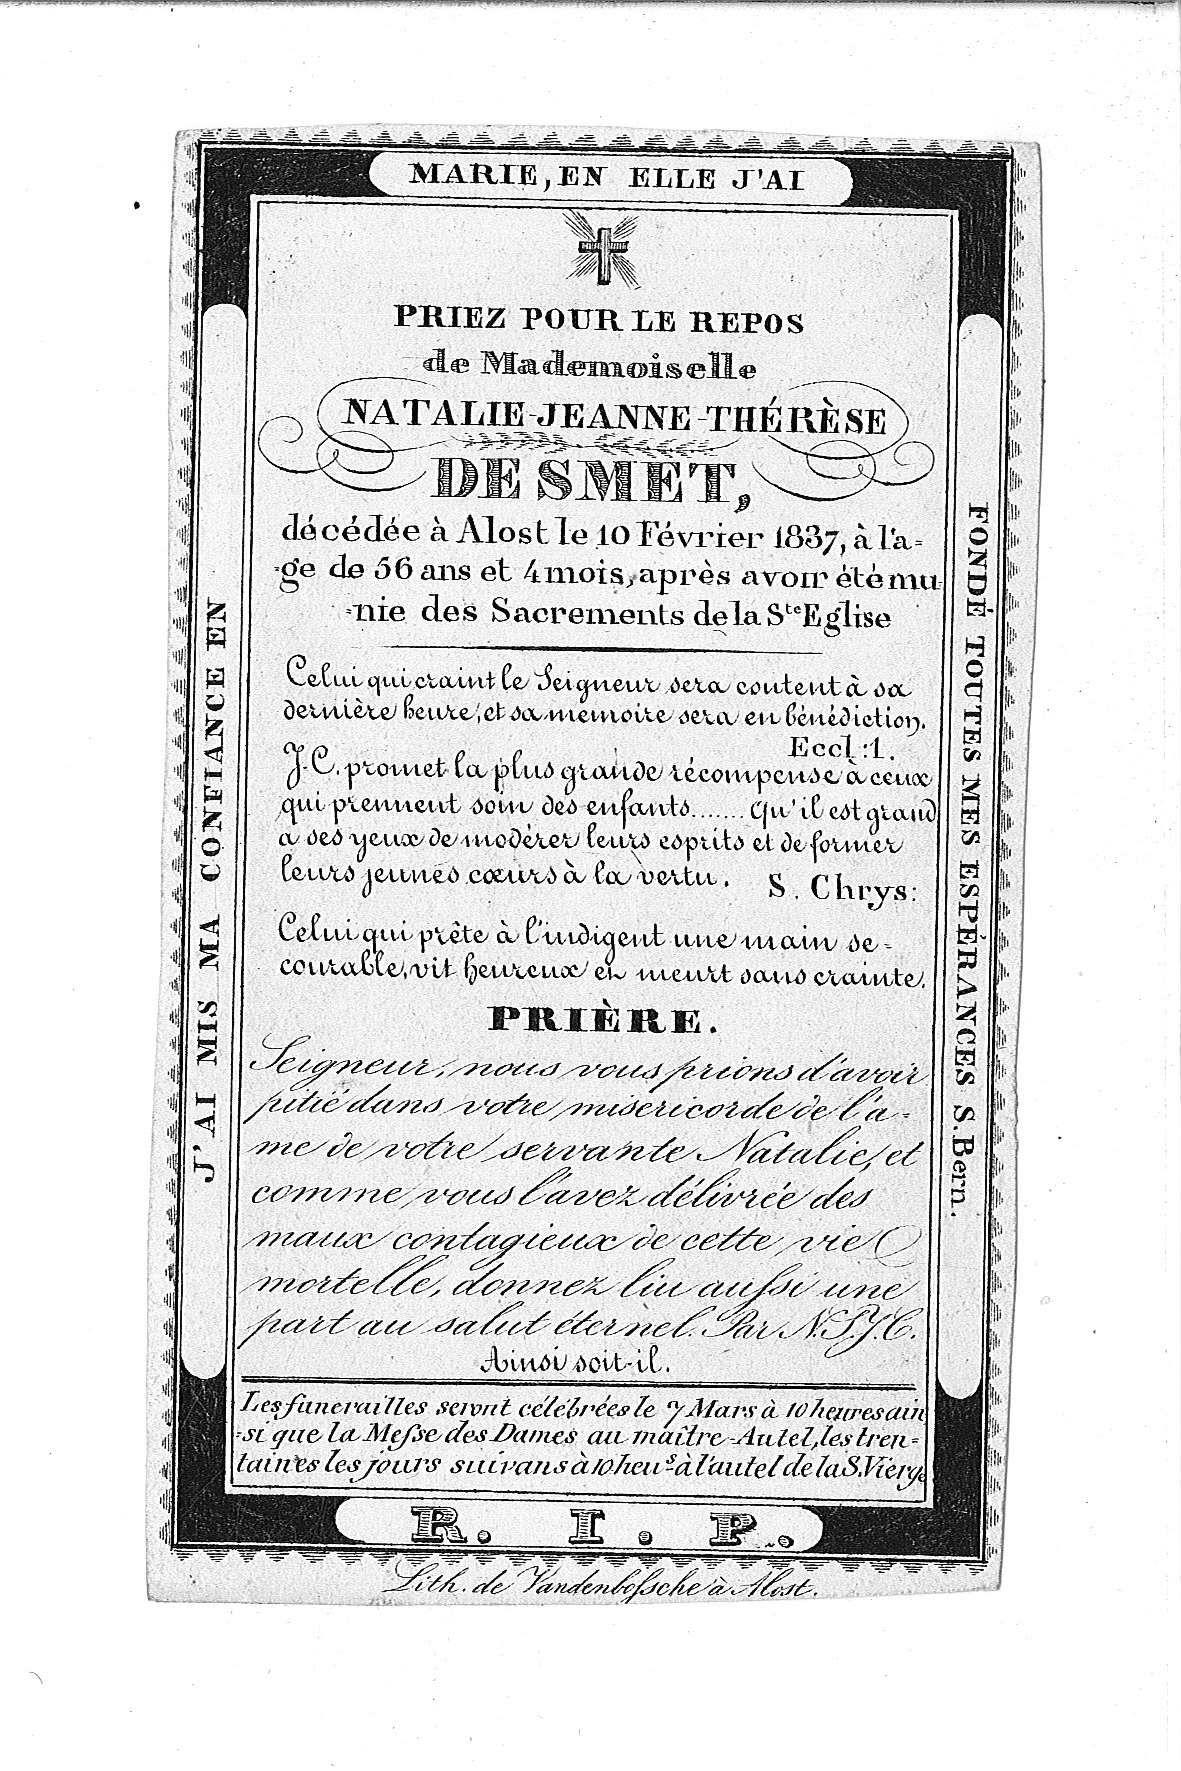 Natalie-Jeanne-Thérèse (1837) 20120504095506_00190.jpg